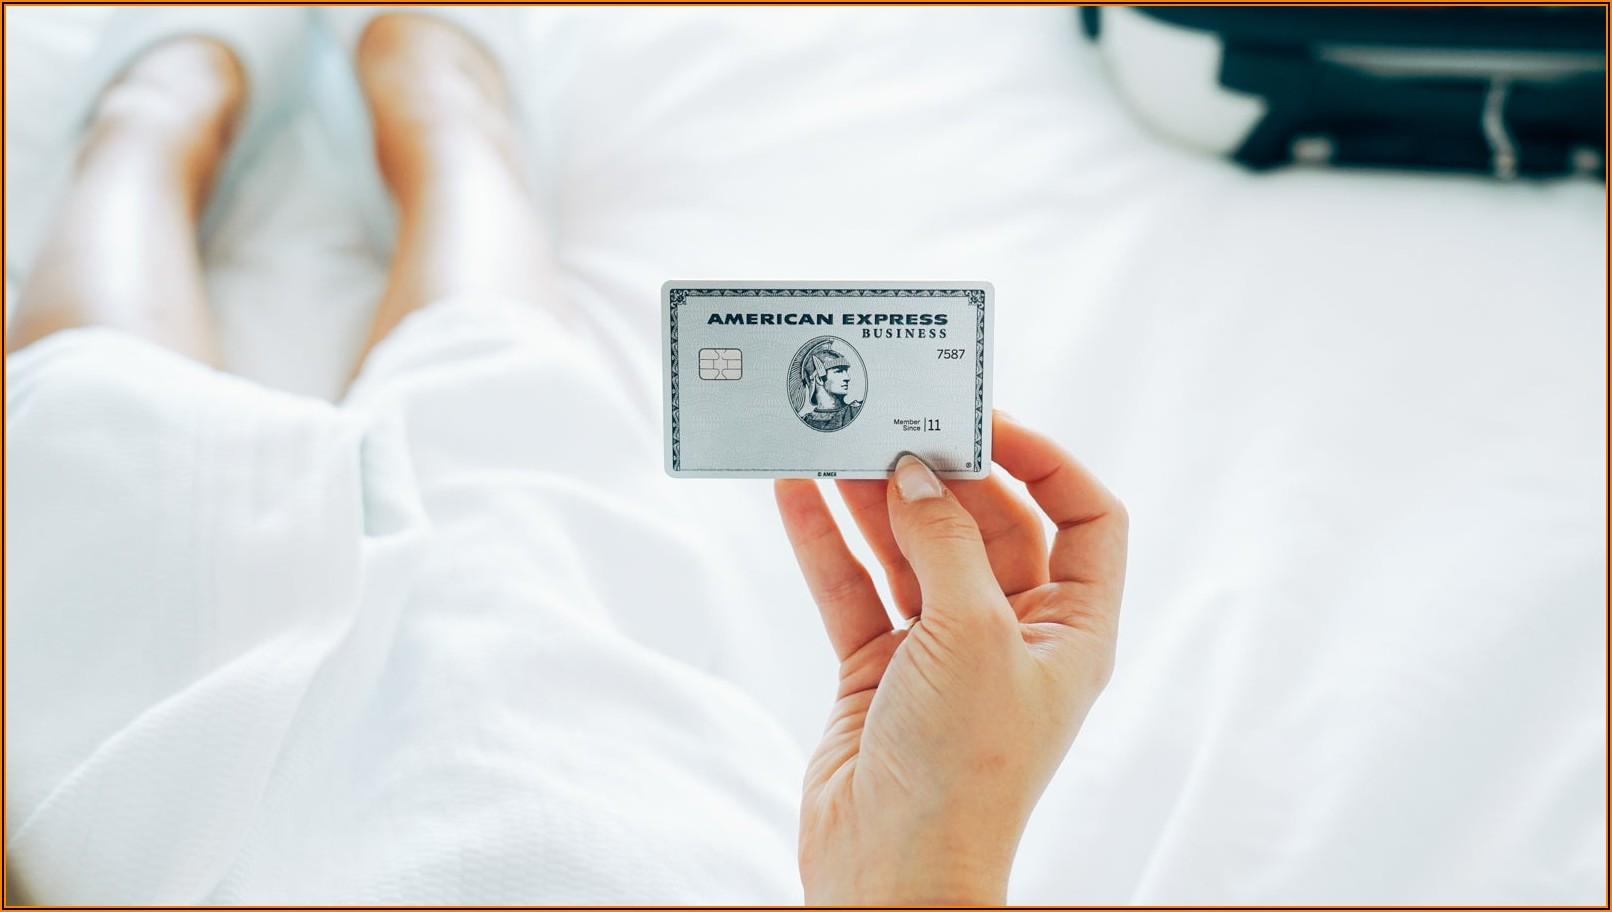 Delta Reserve Business Card